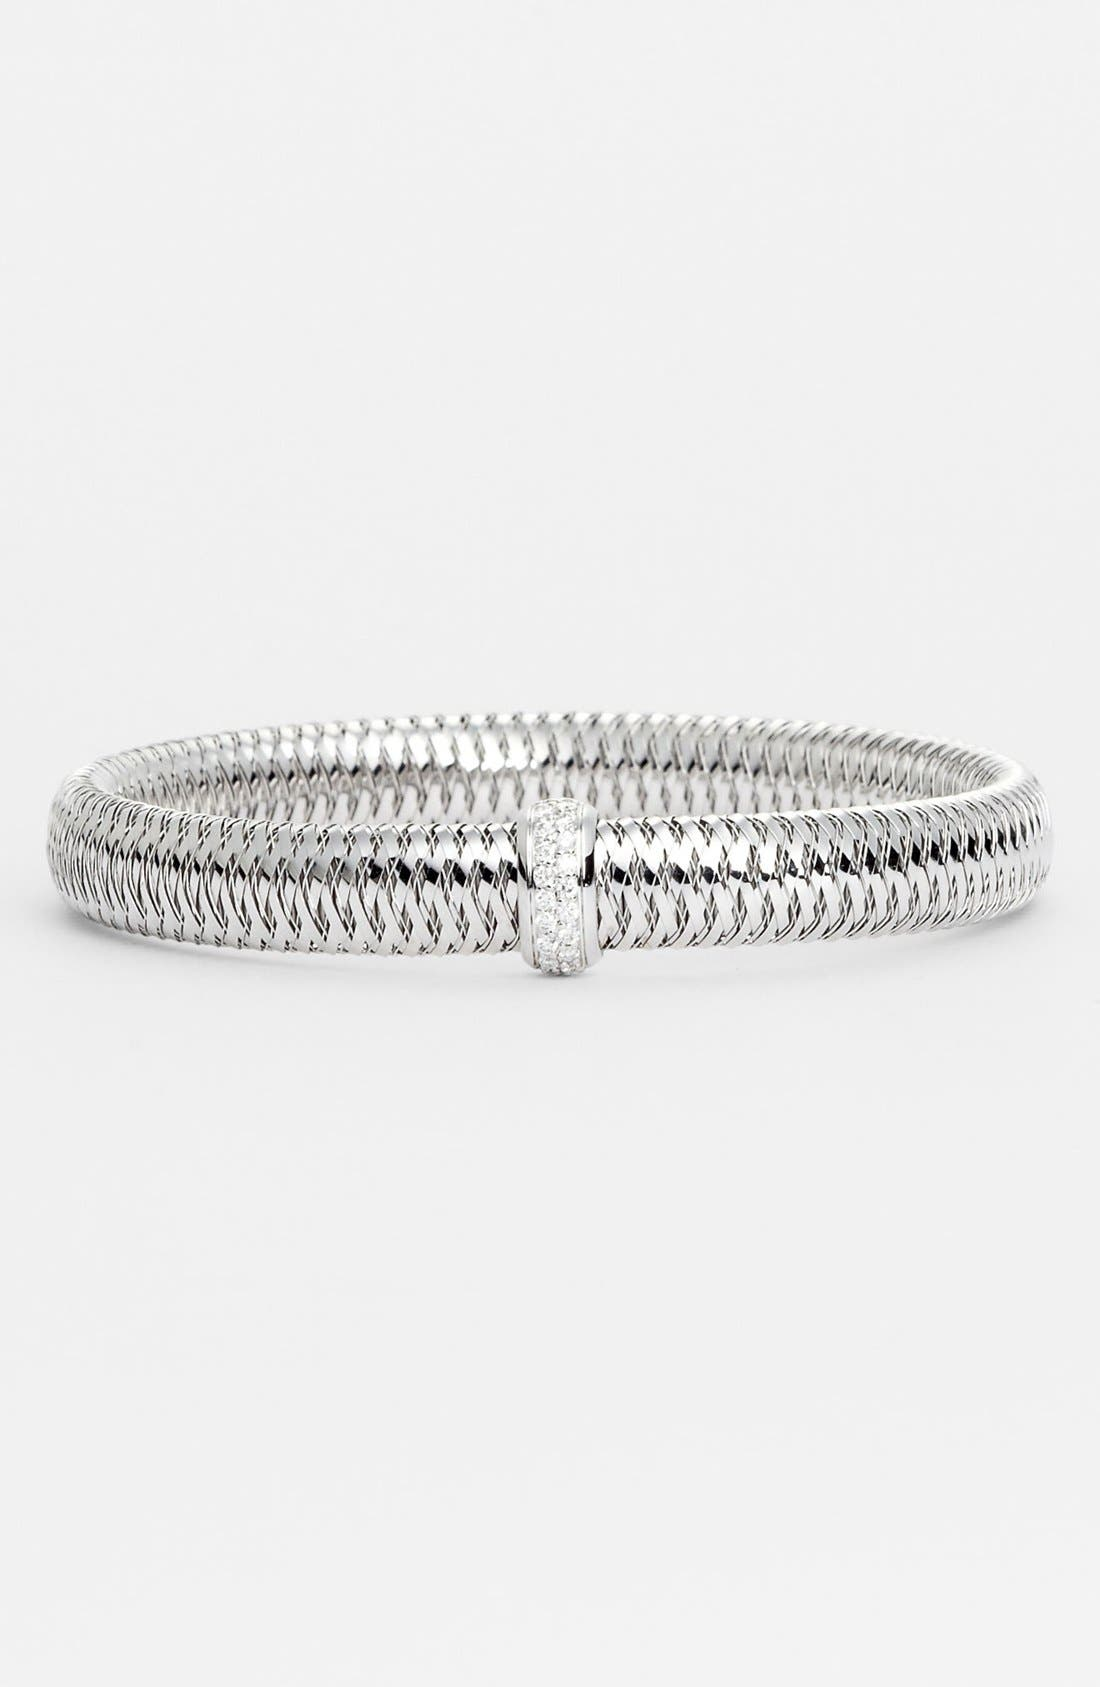 Alternate Image 1 Selected - Roberto Coin 'Primavera' Medium Diamond Bracelet